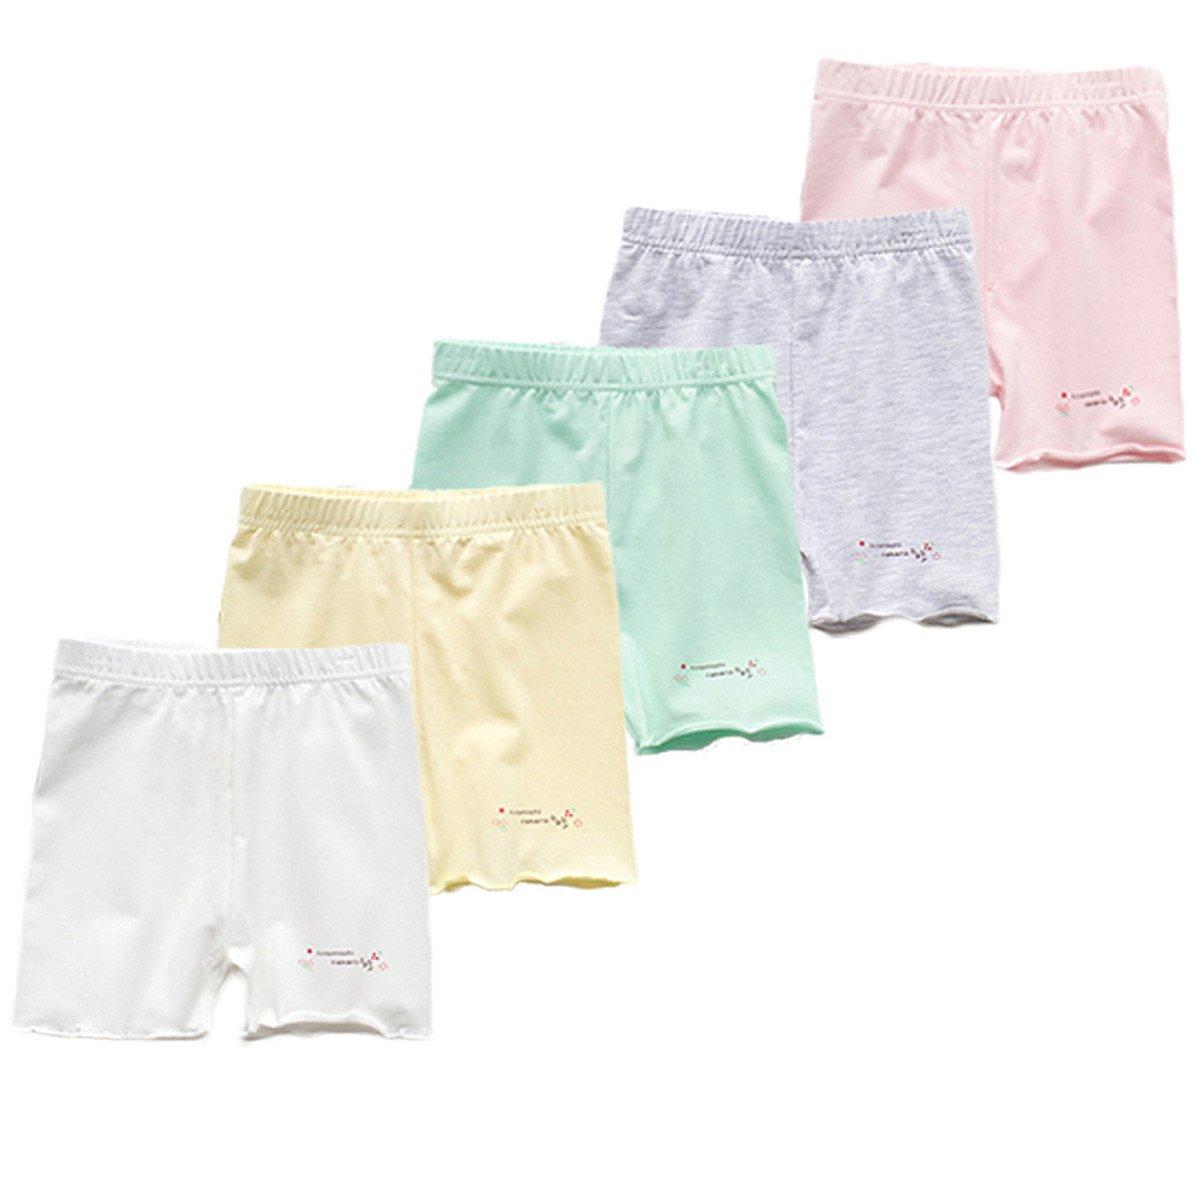 JELEUON 5Pcs Little Girls Kids Candy Color Gymnastics Slim Elastic Safety Bike Short Panties 7-8Y